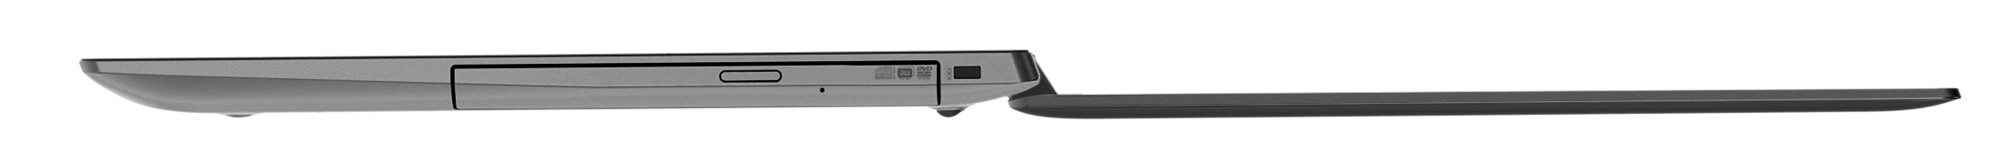 Фото  Ноутбук Lenovo ideapad 330-15 Onyx Black (81D100MWRA)